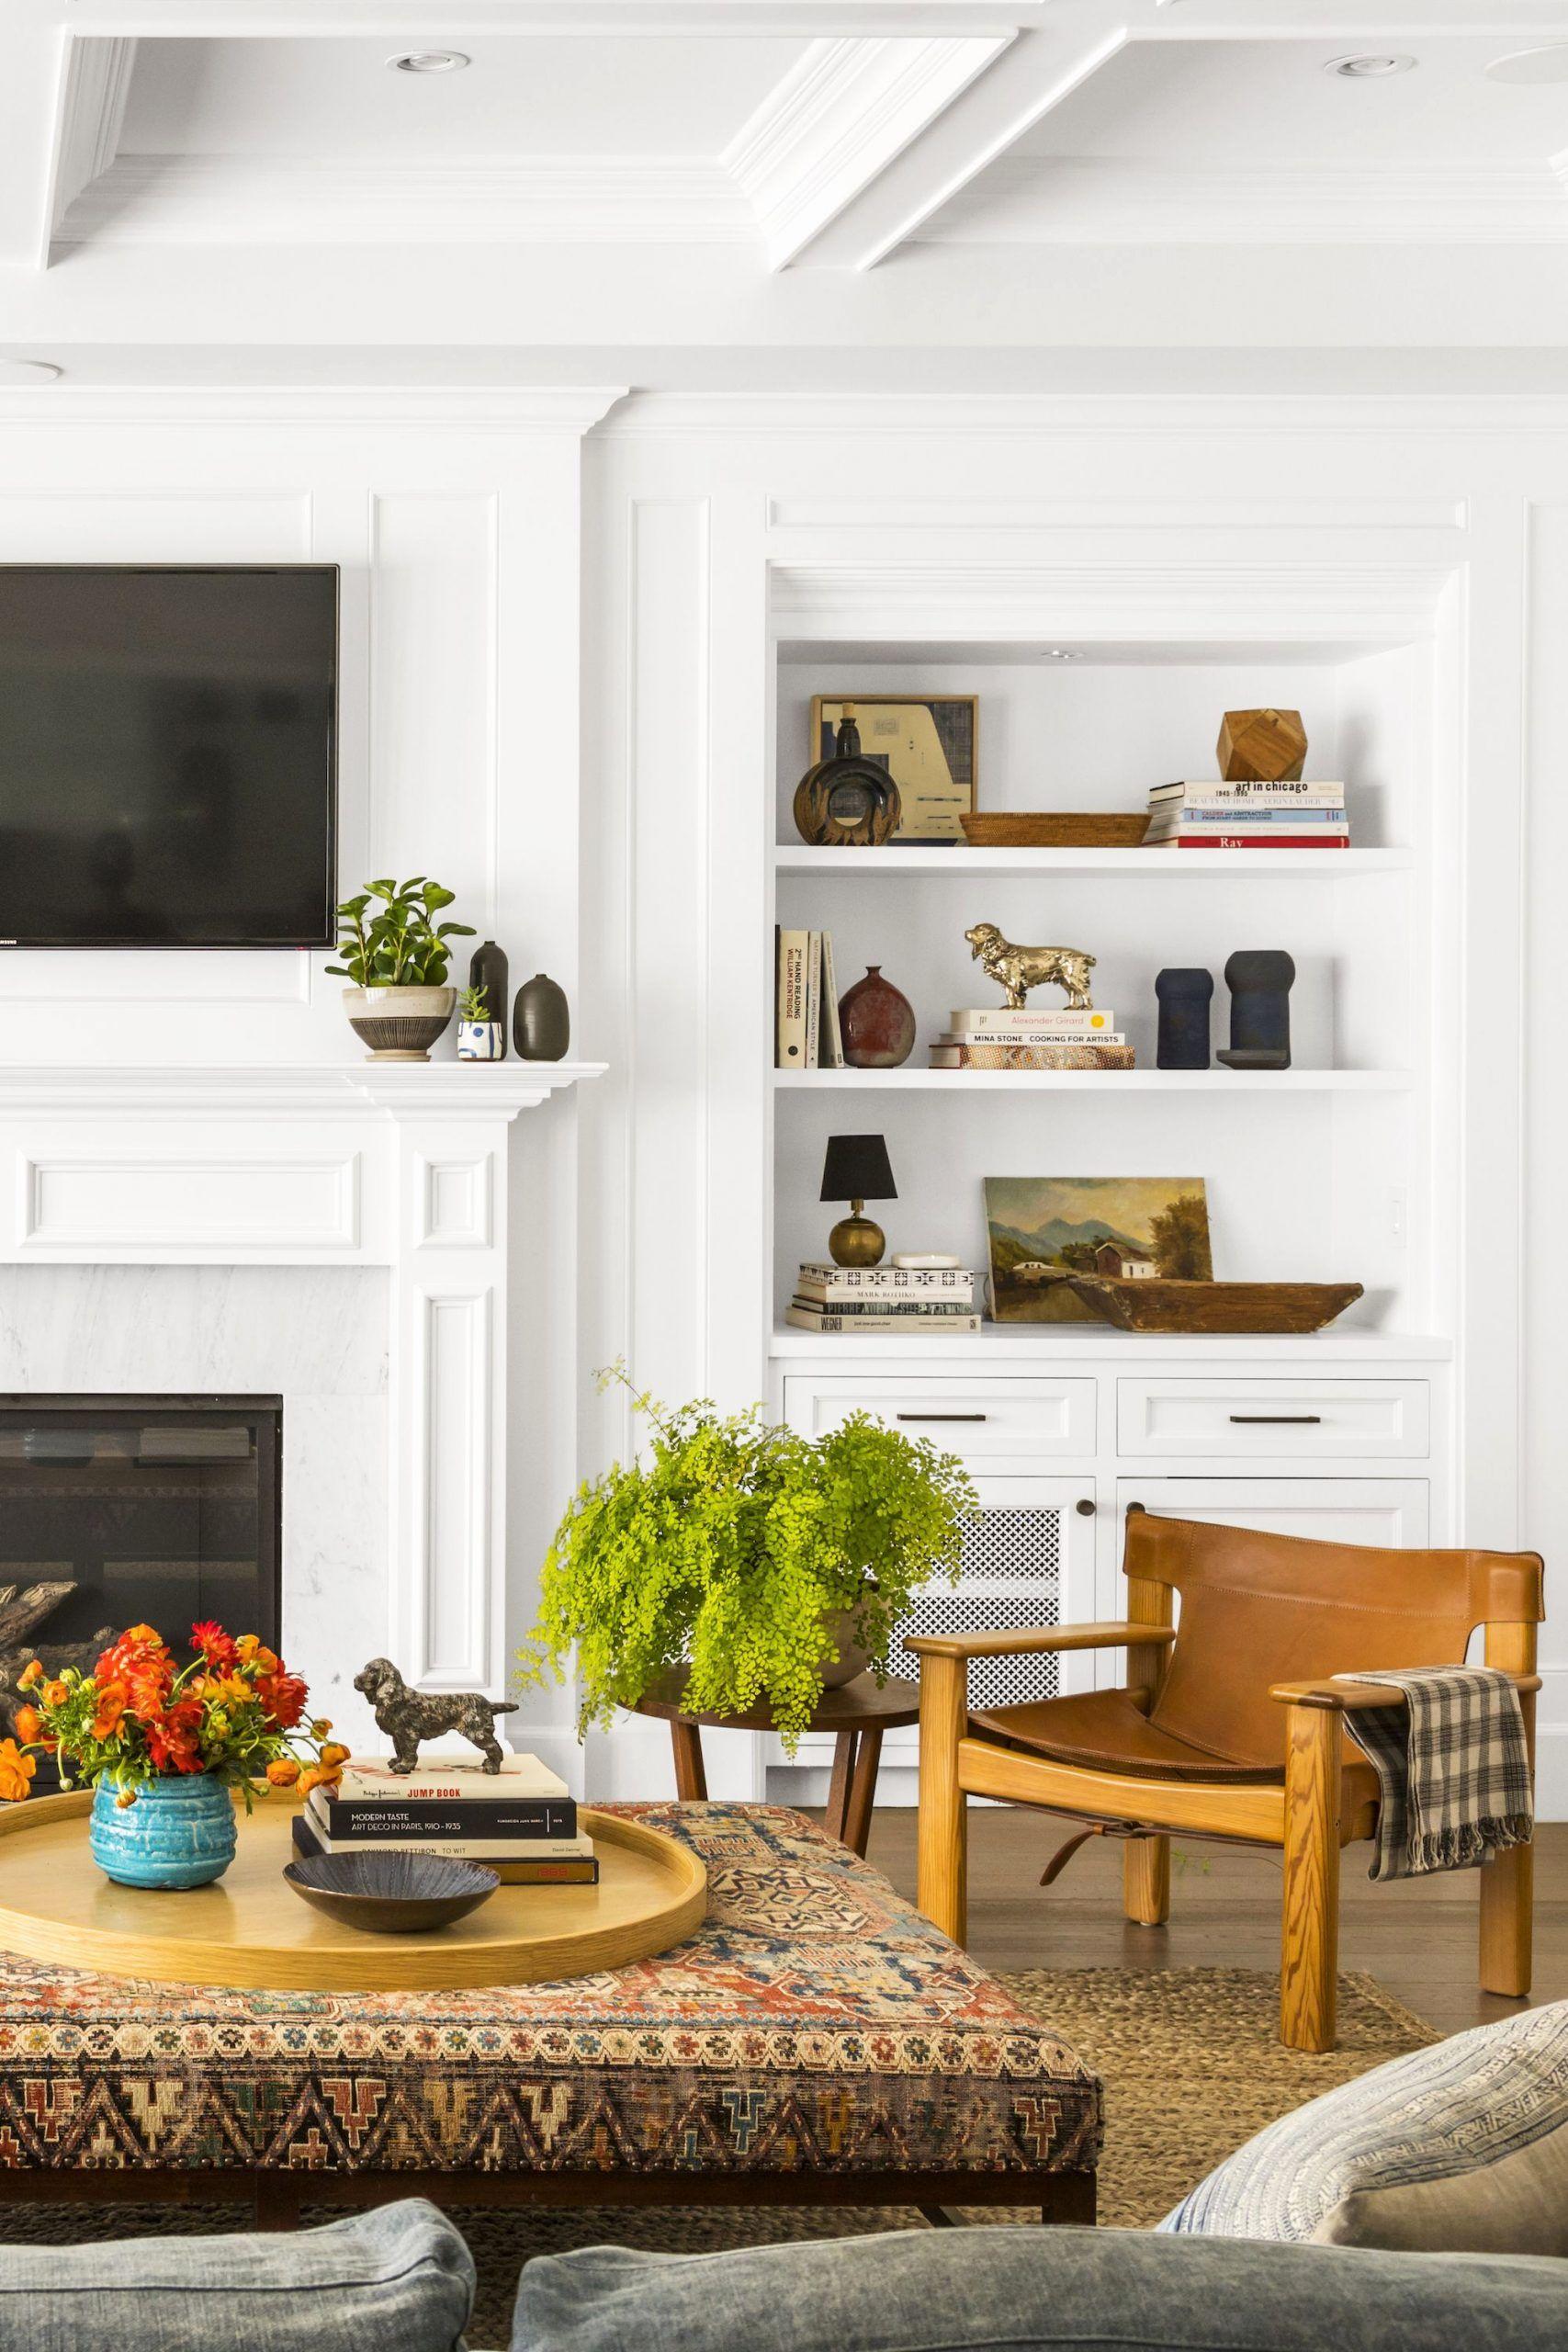 Creative Living Room Ideas Inspirational 53 Best Living Room Ideas Stylish Living Room Decorating In 2020 Living Room Design Modern Living Room Interior Living Decor